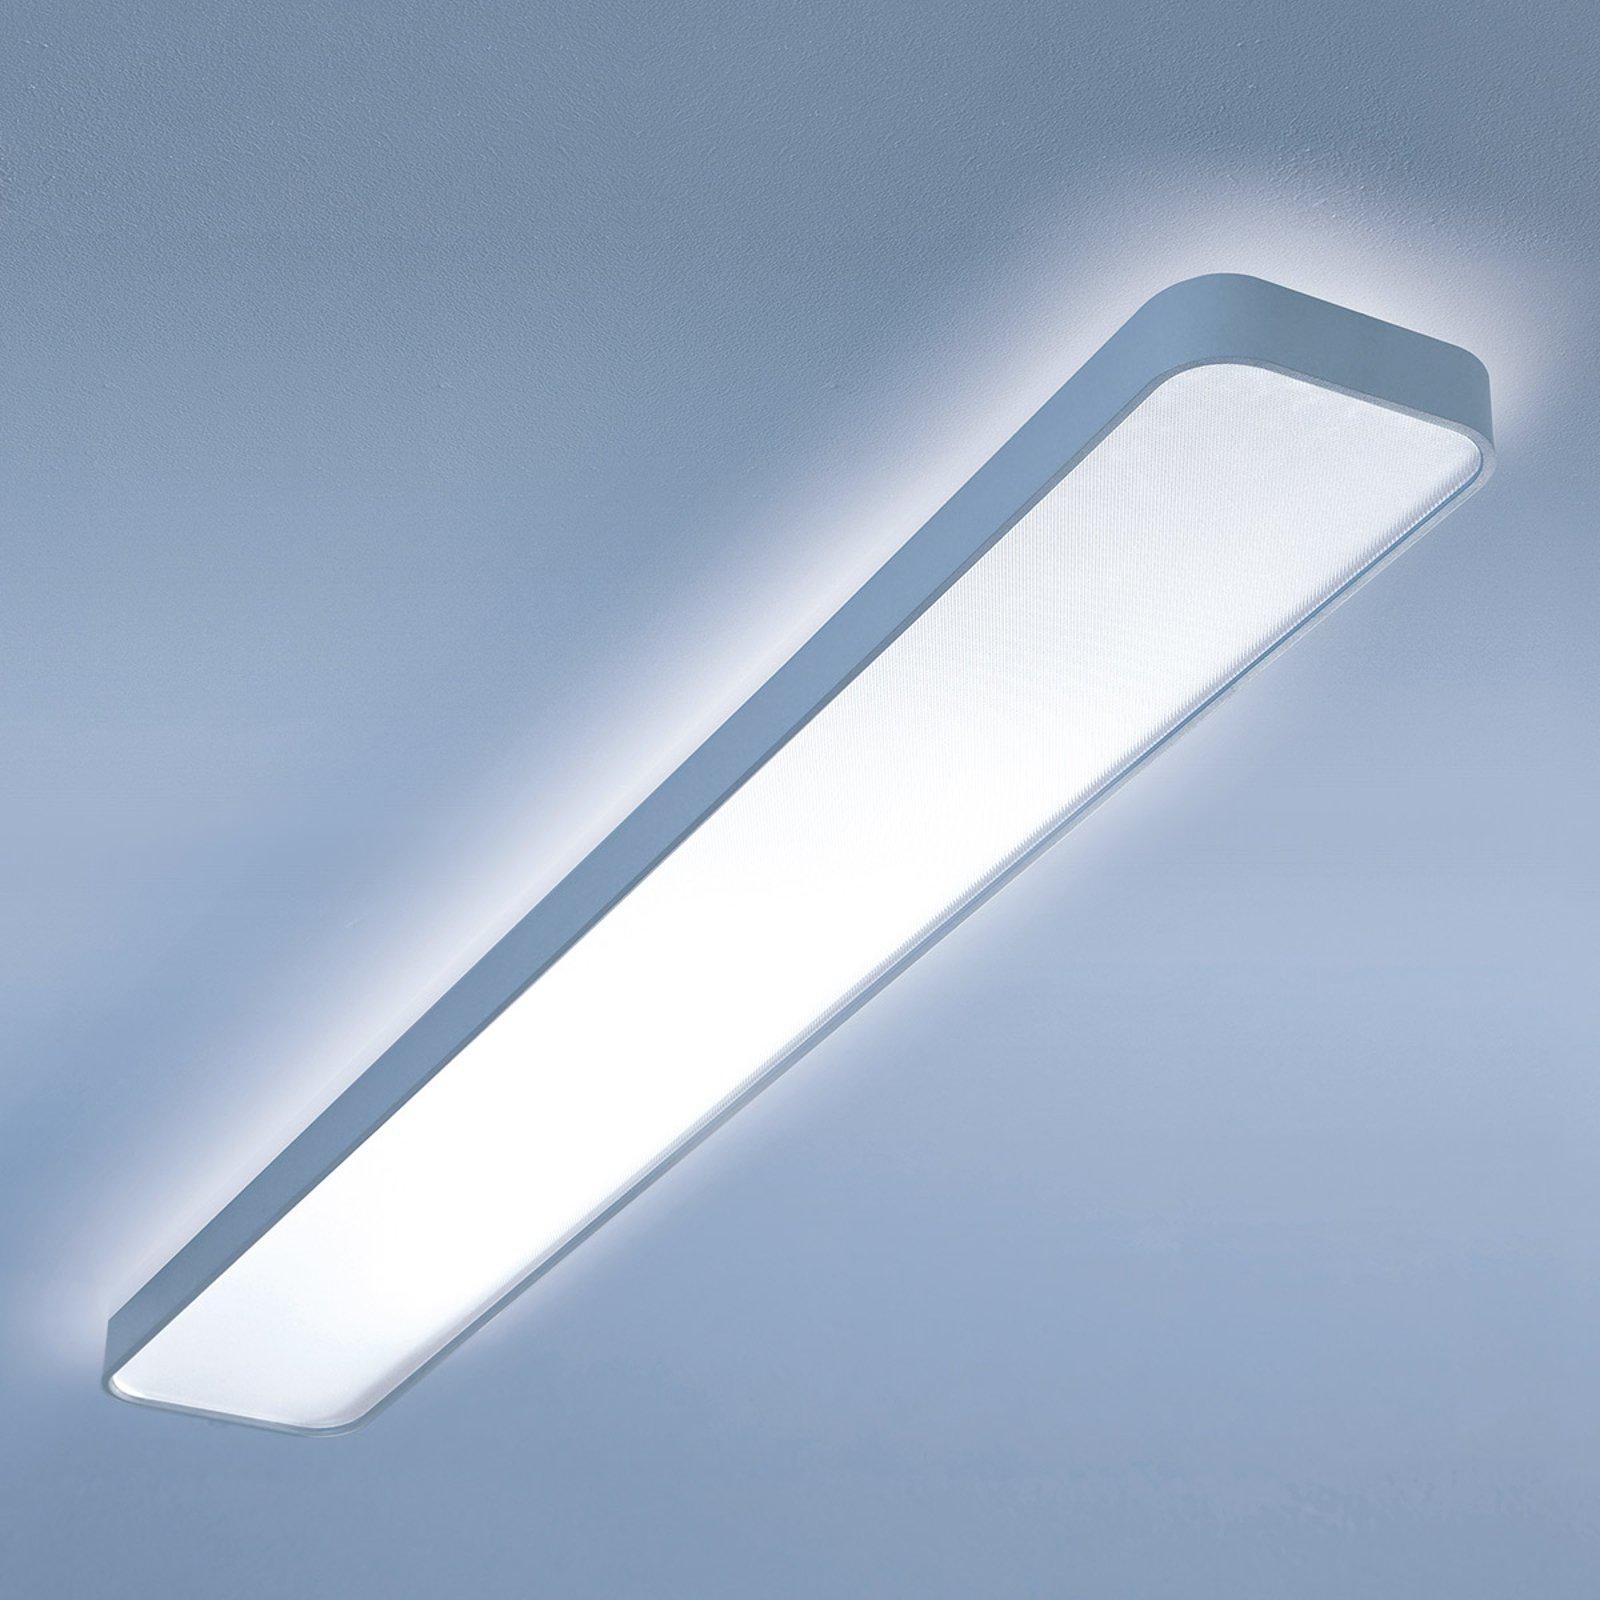 Caleo-X1 universalhvit LED-taklampe 120 cm